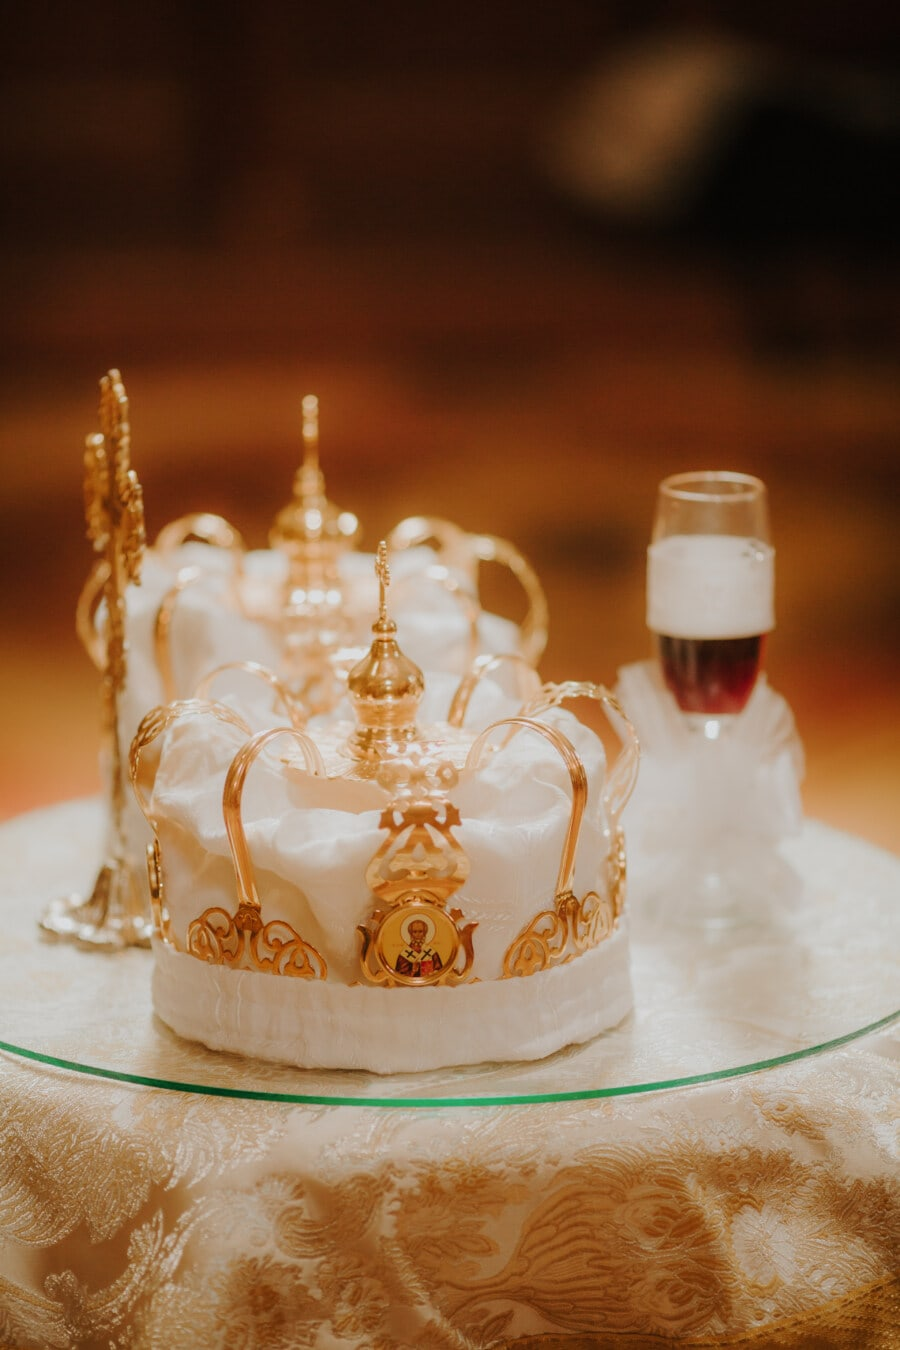 royal, crown, wedding, gold, golden shine, coronation, cross, religious, traditional, celebration